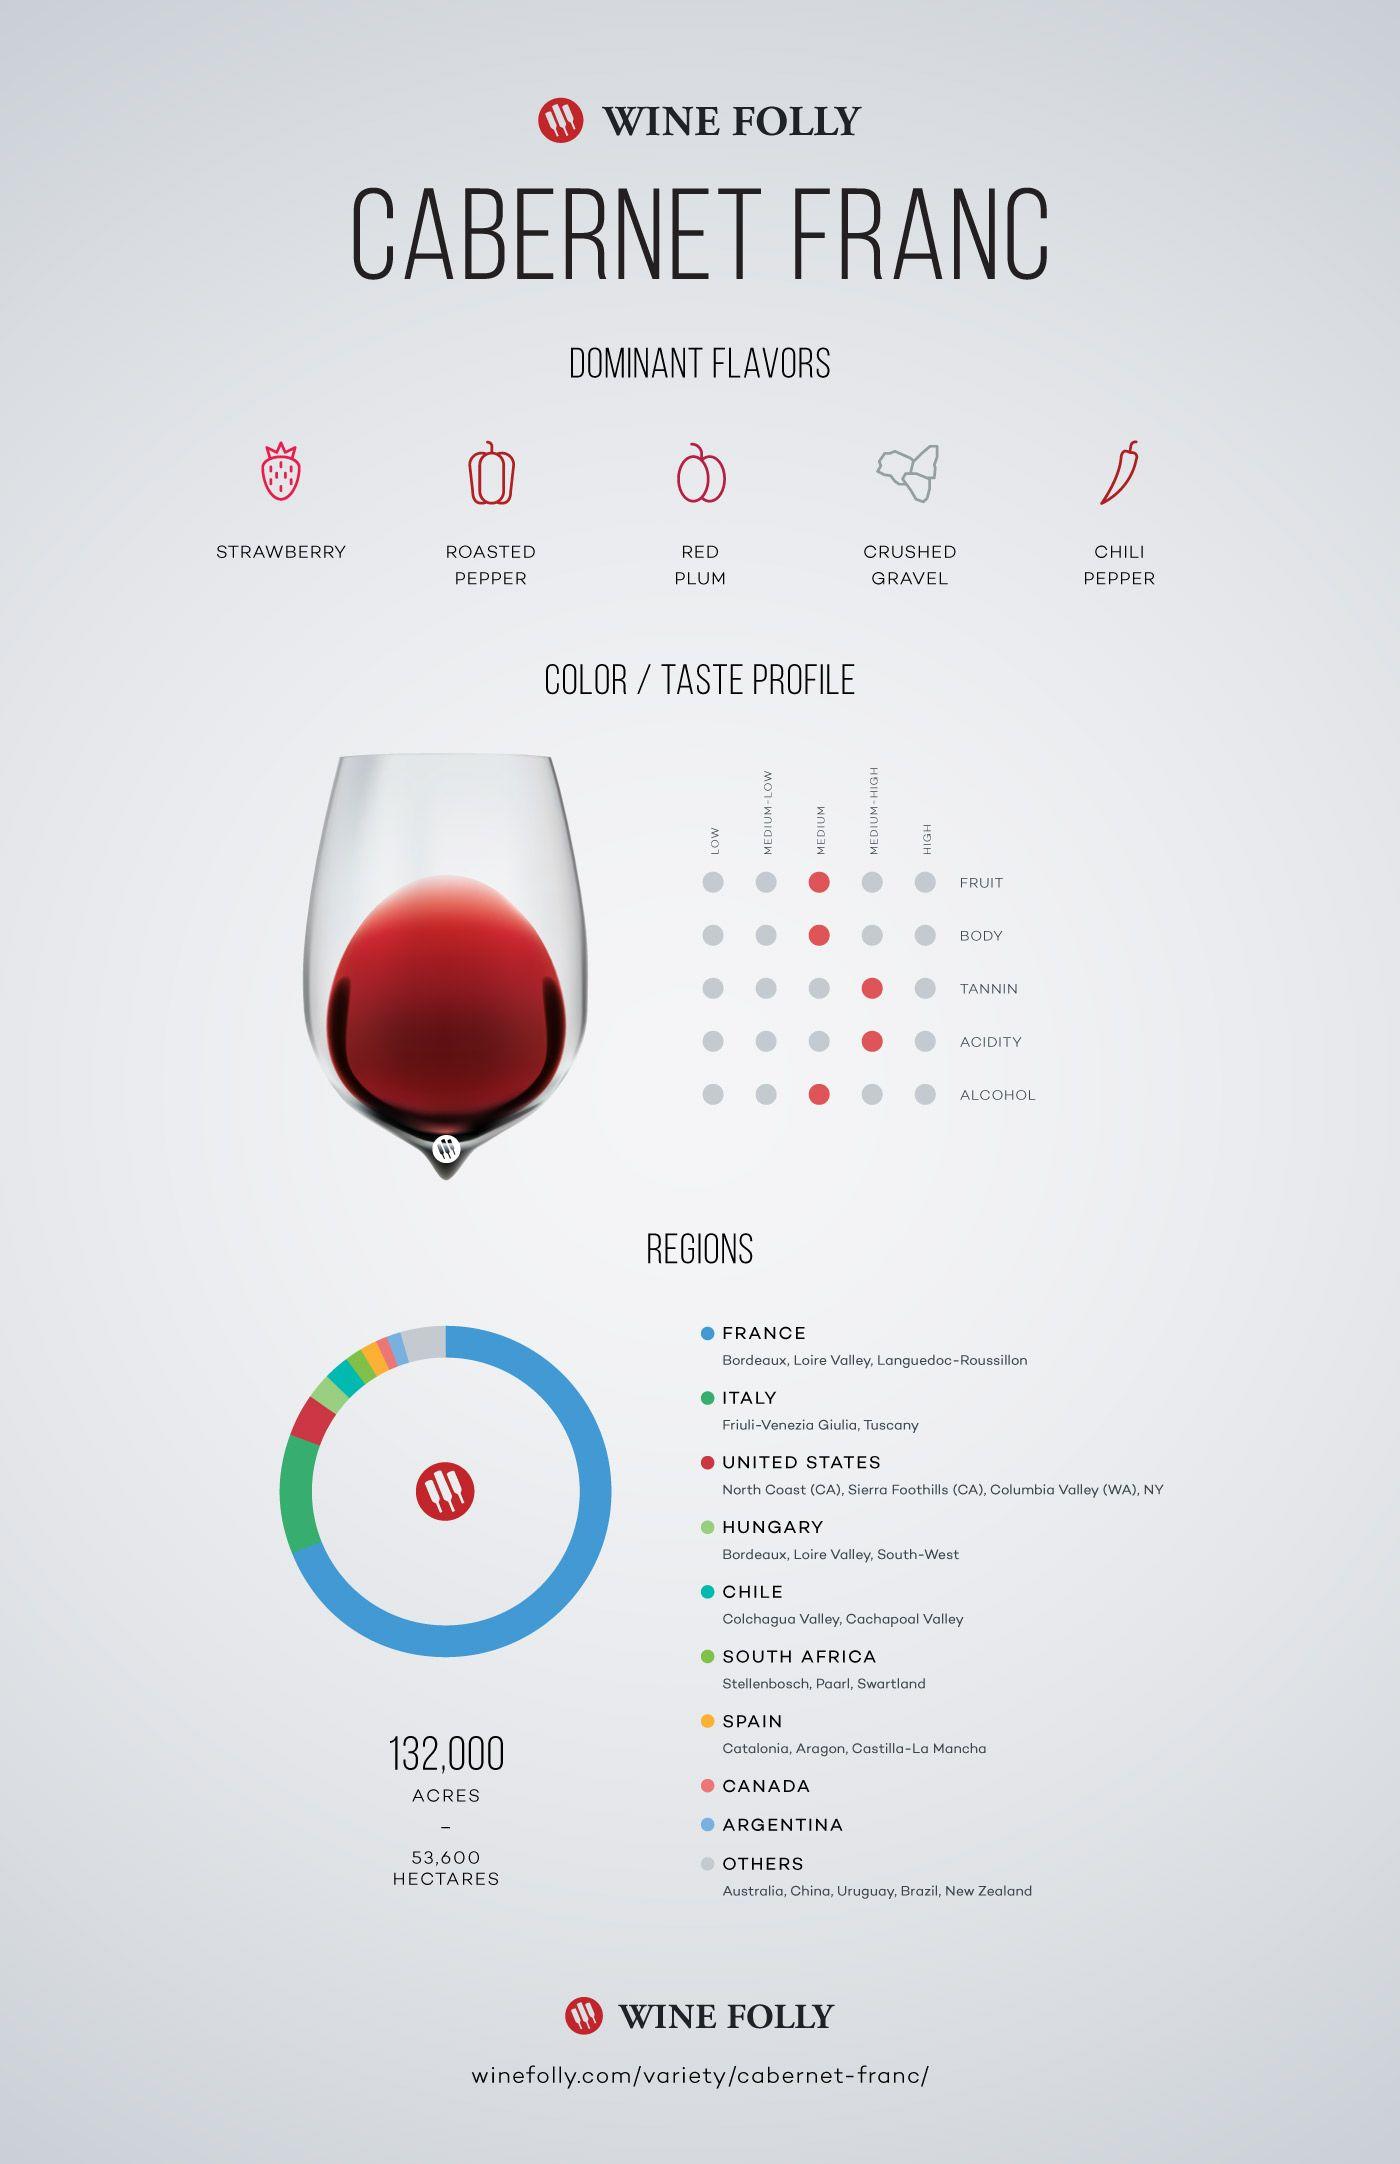 Cabernet Franc Guide - http://winefolly.com/review/cabernet-franc-wine-guide/